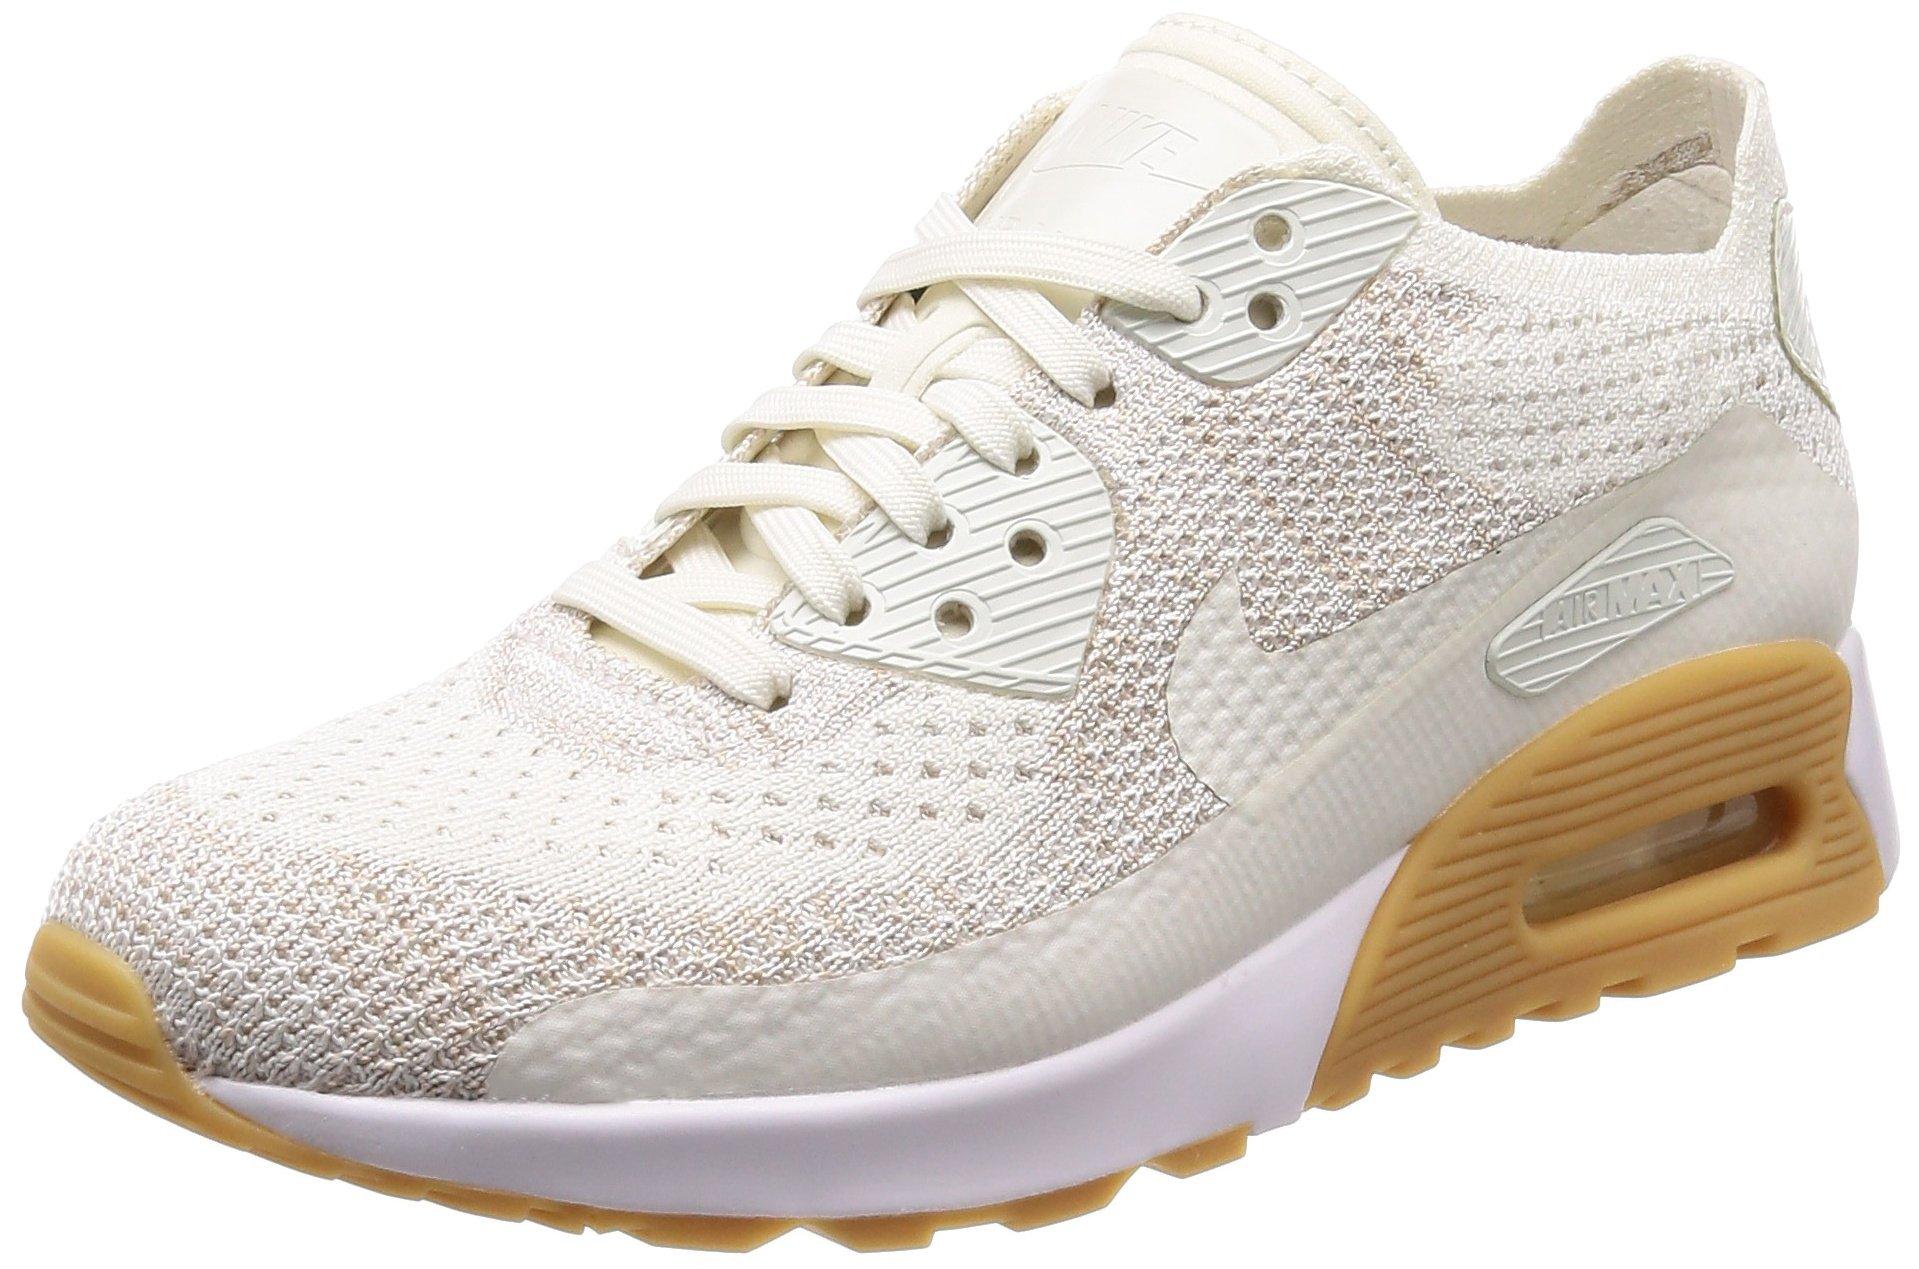 98091ae6648f Galleon - Nike Womens Air Max 90 Ultra 2.0 Flyknit Running Shoe (7.5 M US